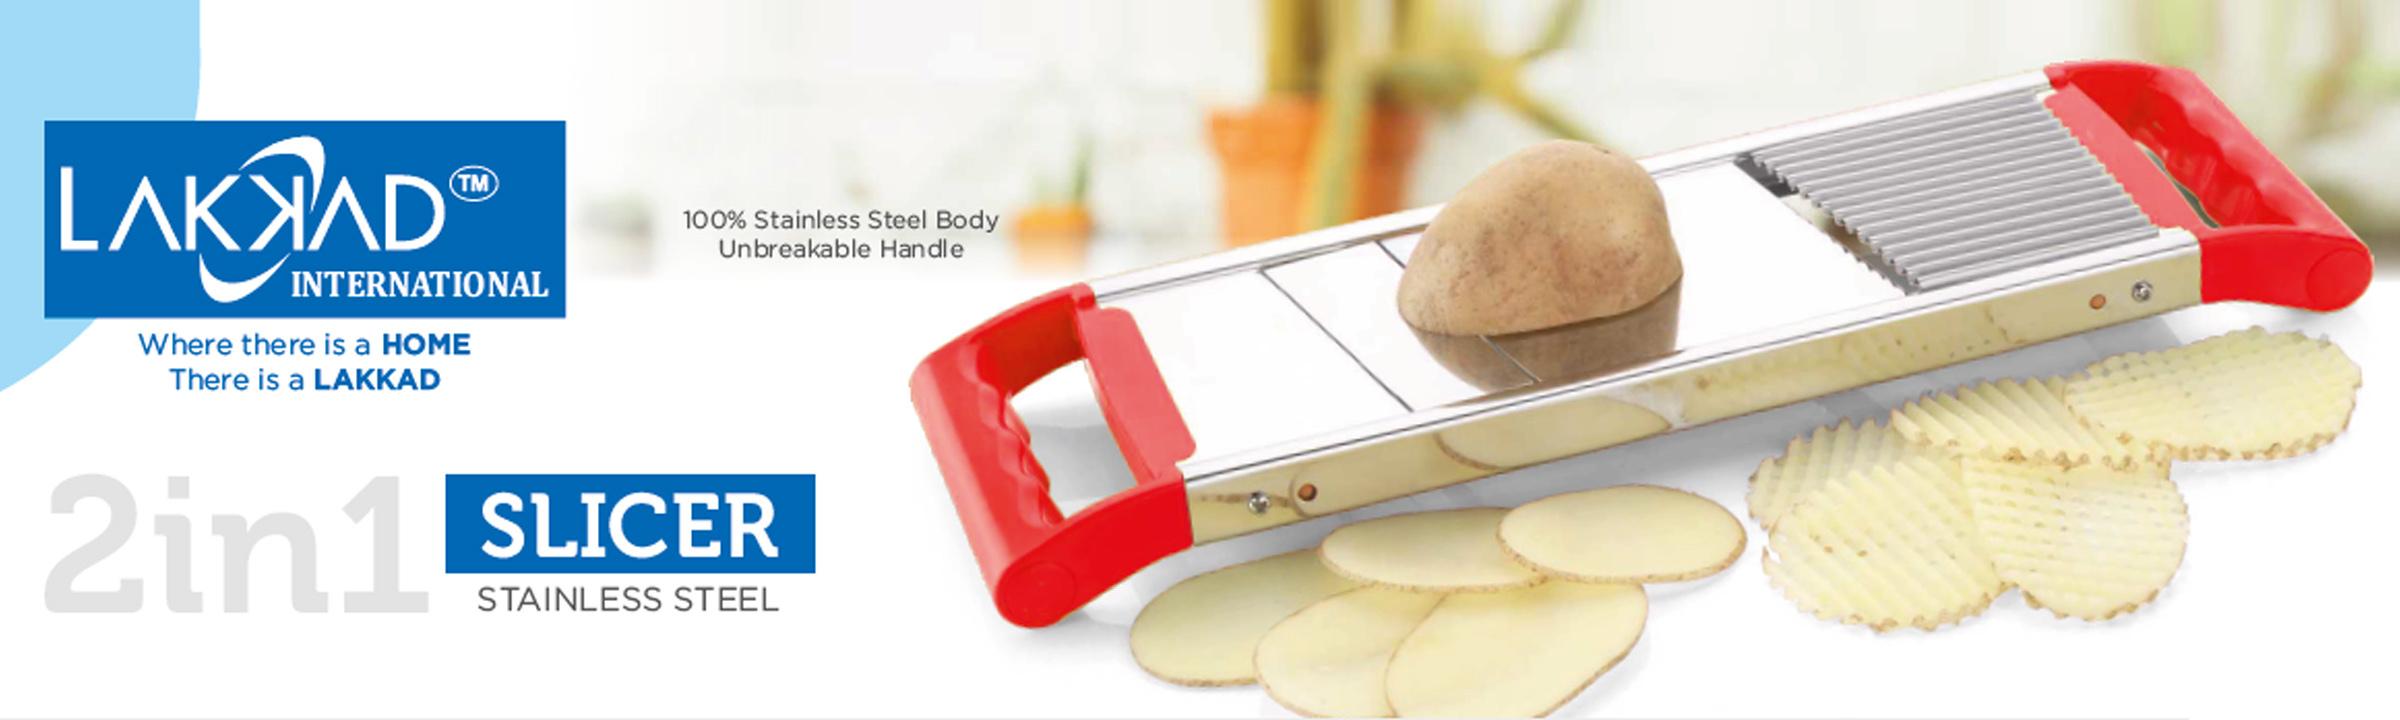 Potato Slicer